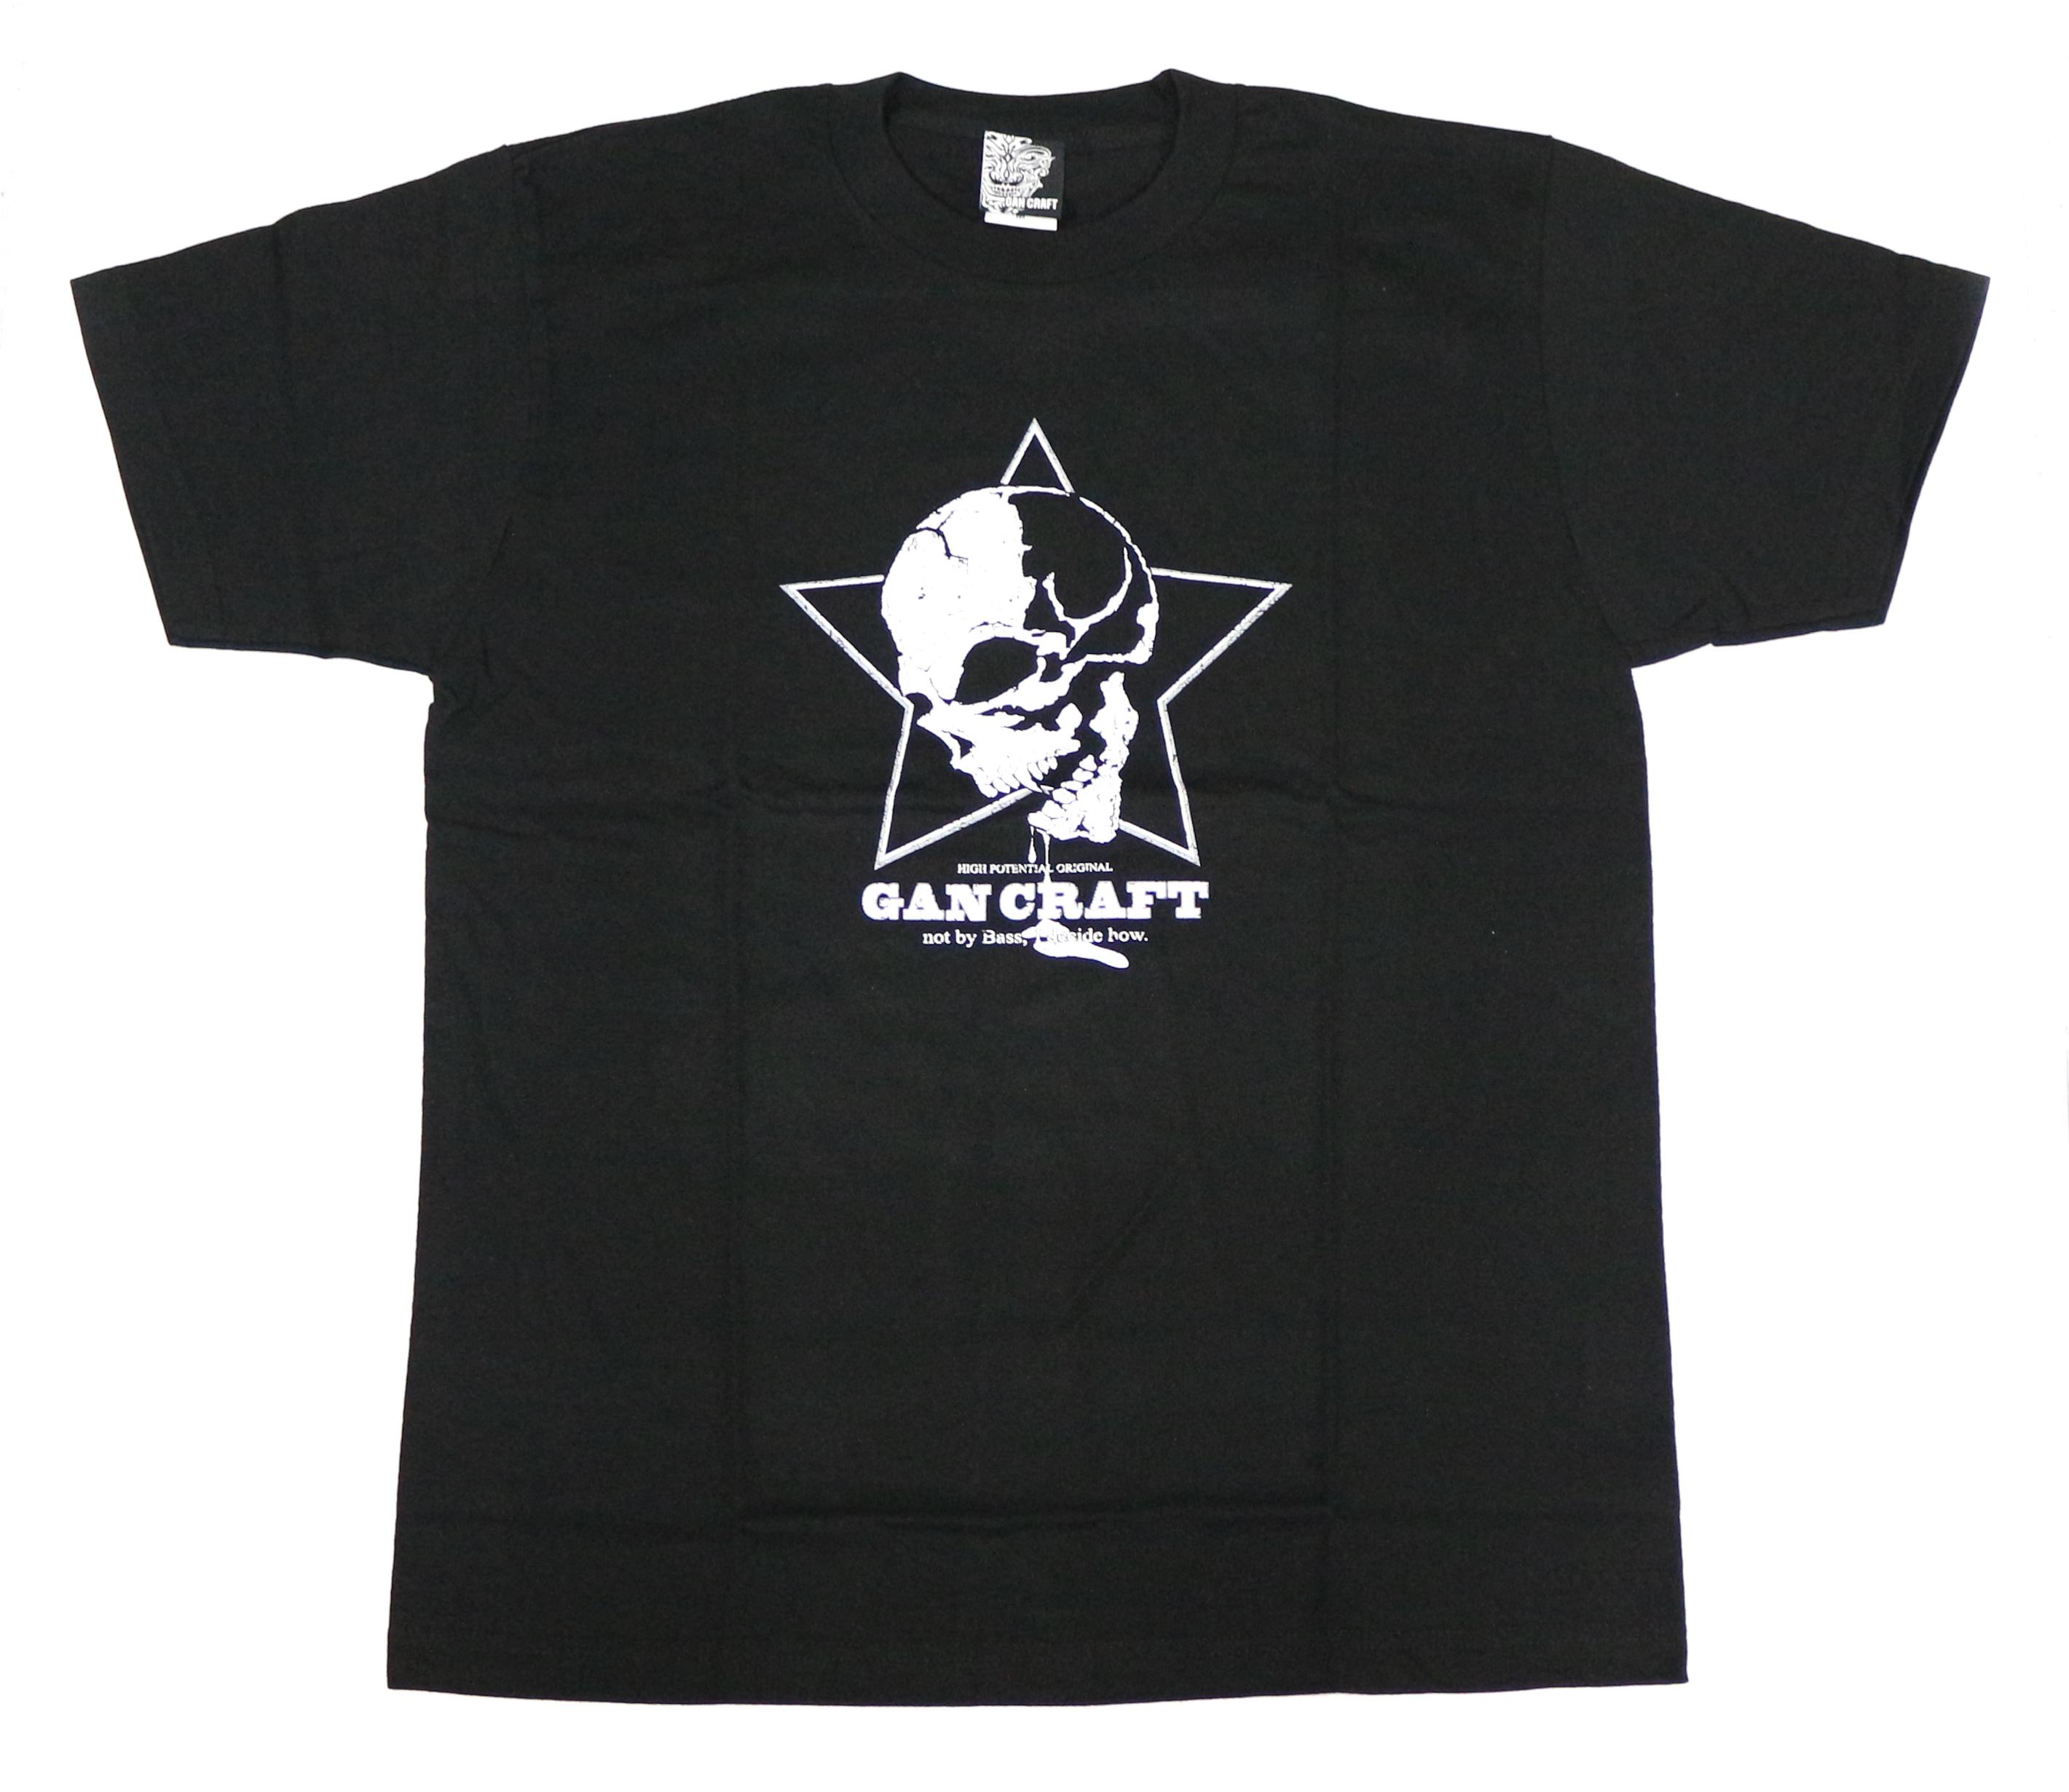 Gan Craft T Shirt Short Sleeve Star Skull Tee Size L Black (3712)